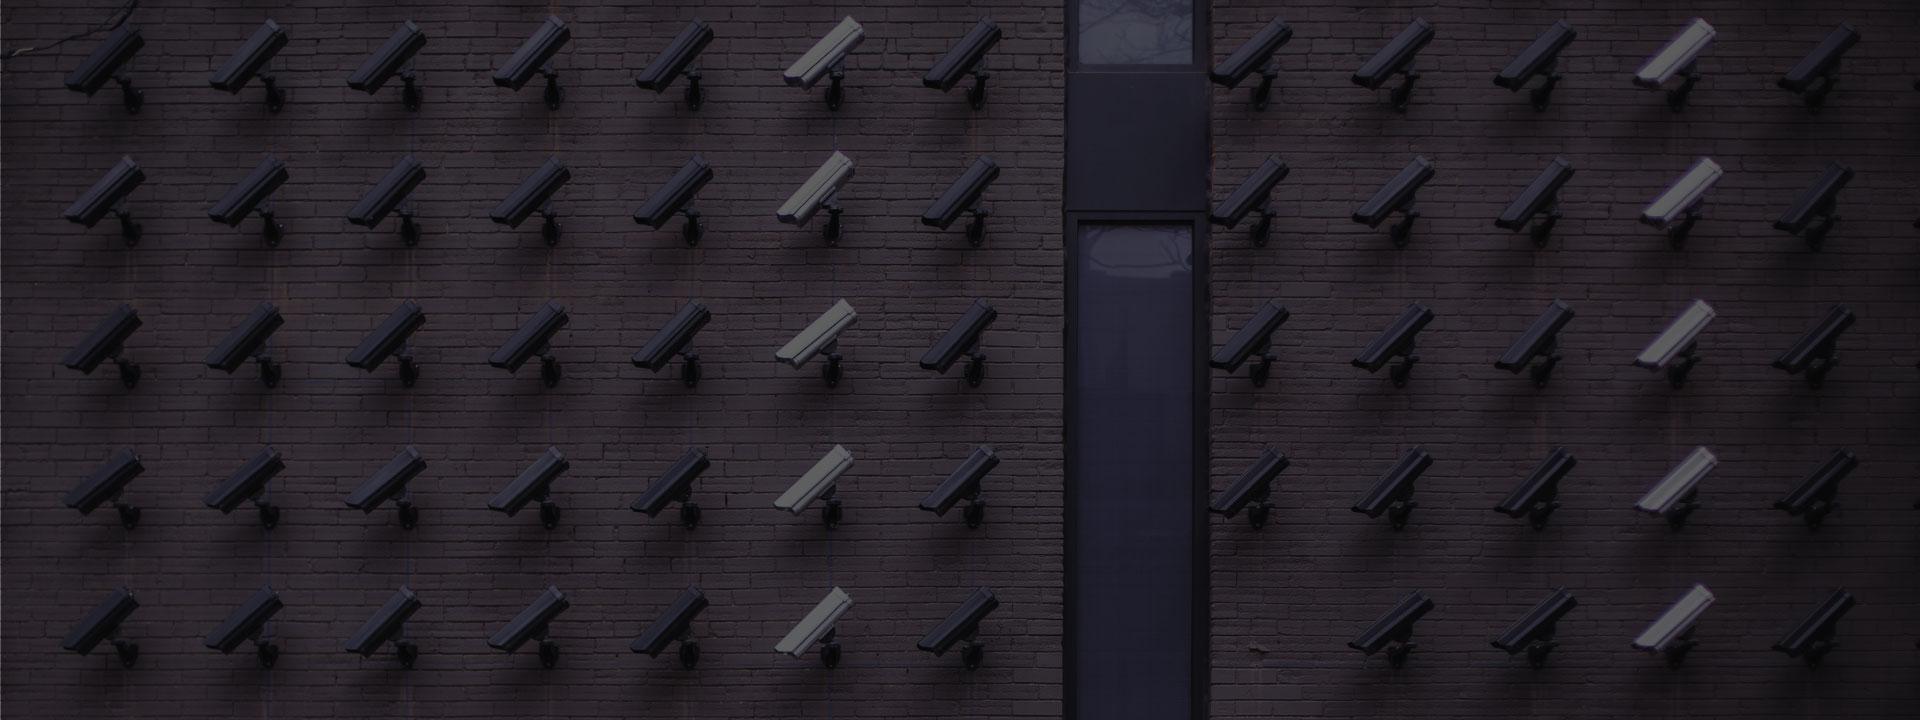 Sistemi di sicurezza integrati